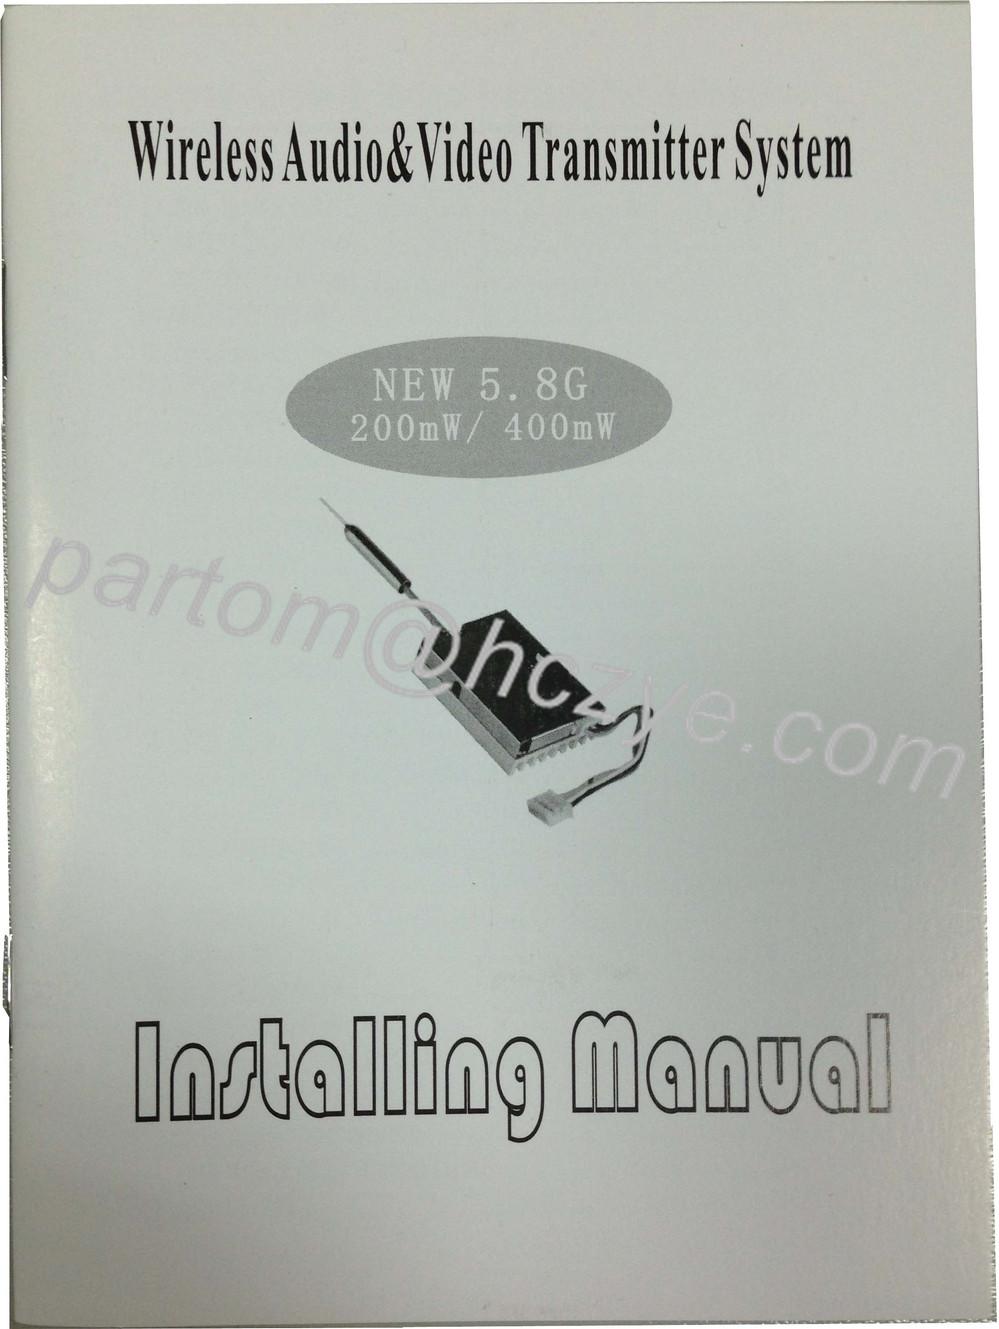 Long range wireless transmitter and receiver